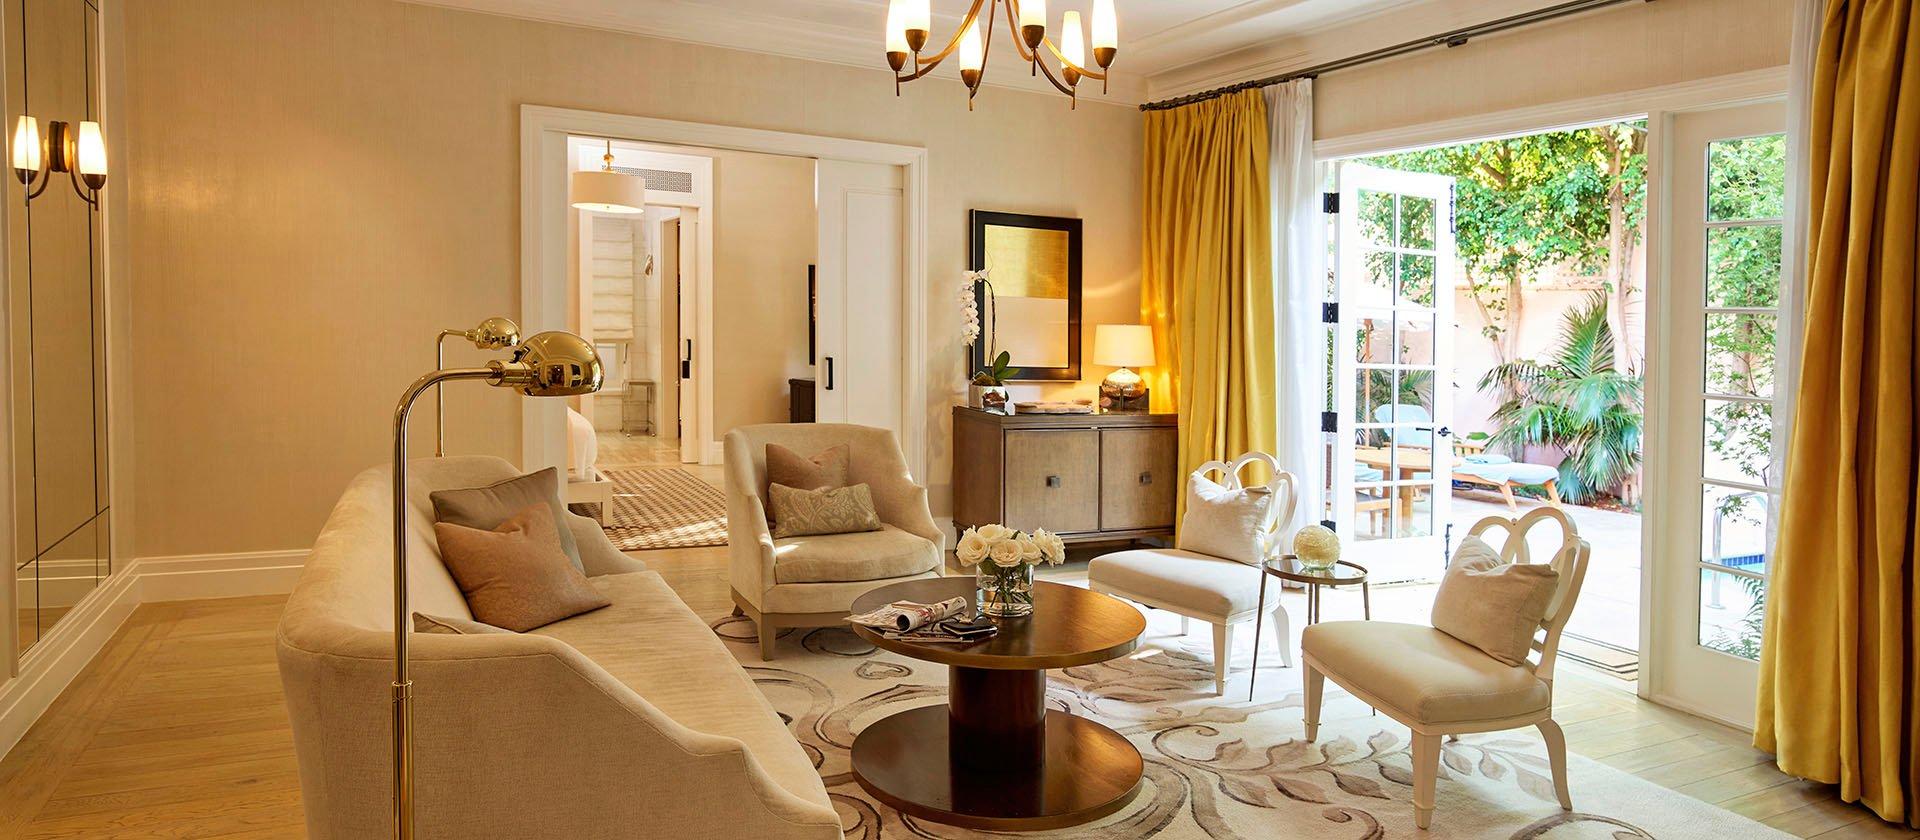 Hotel Bel-Air's Grace Kelly Suite